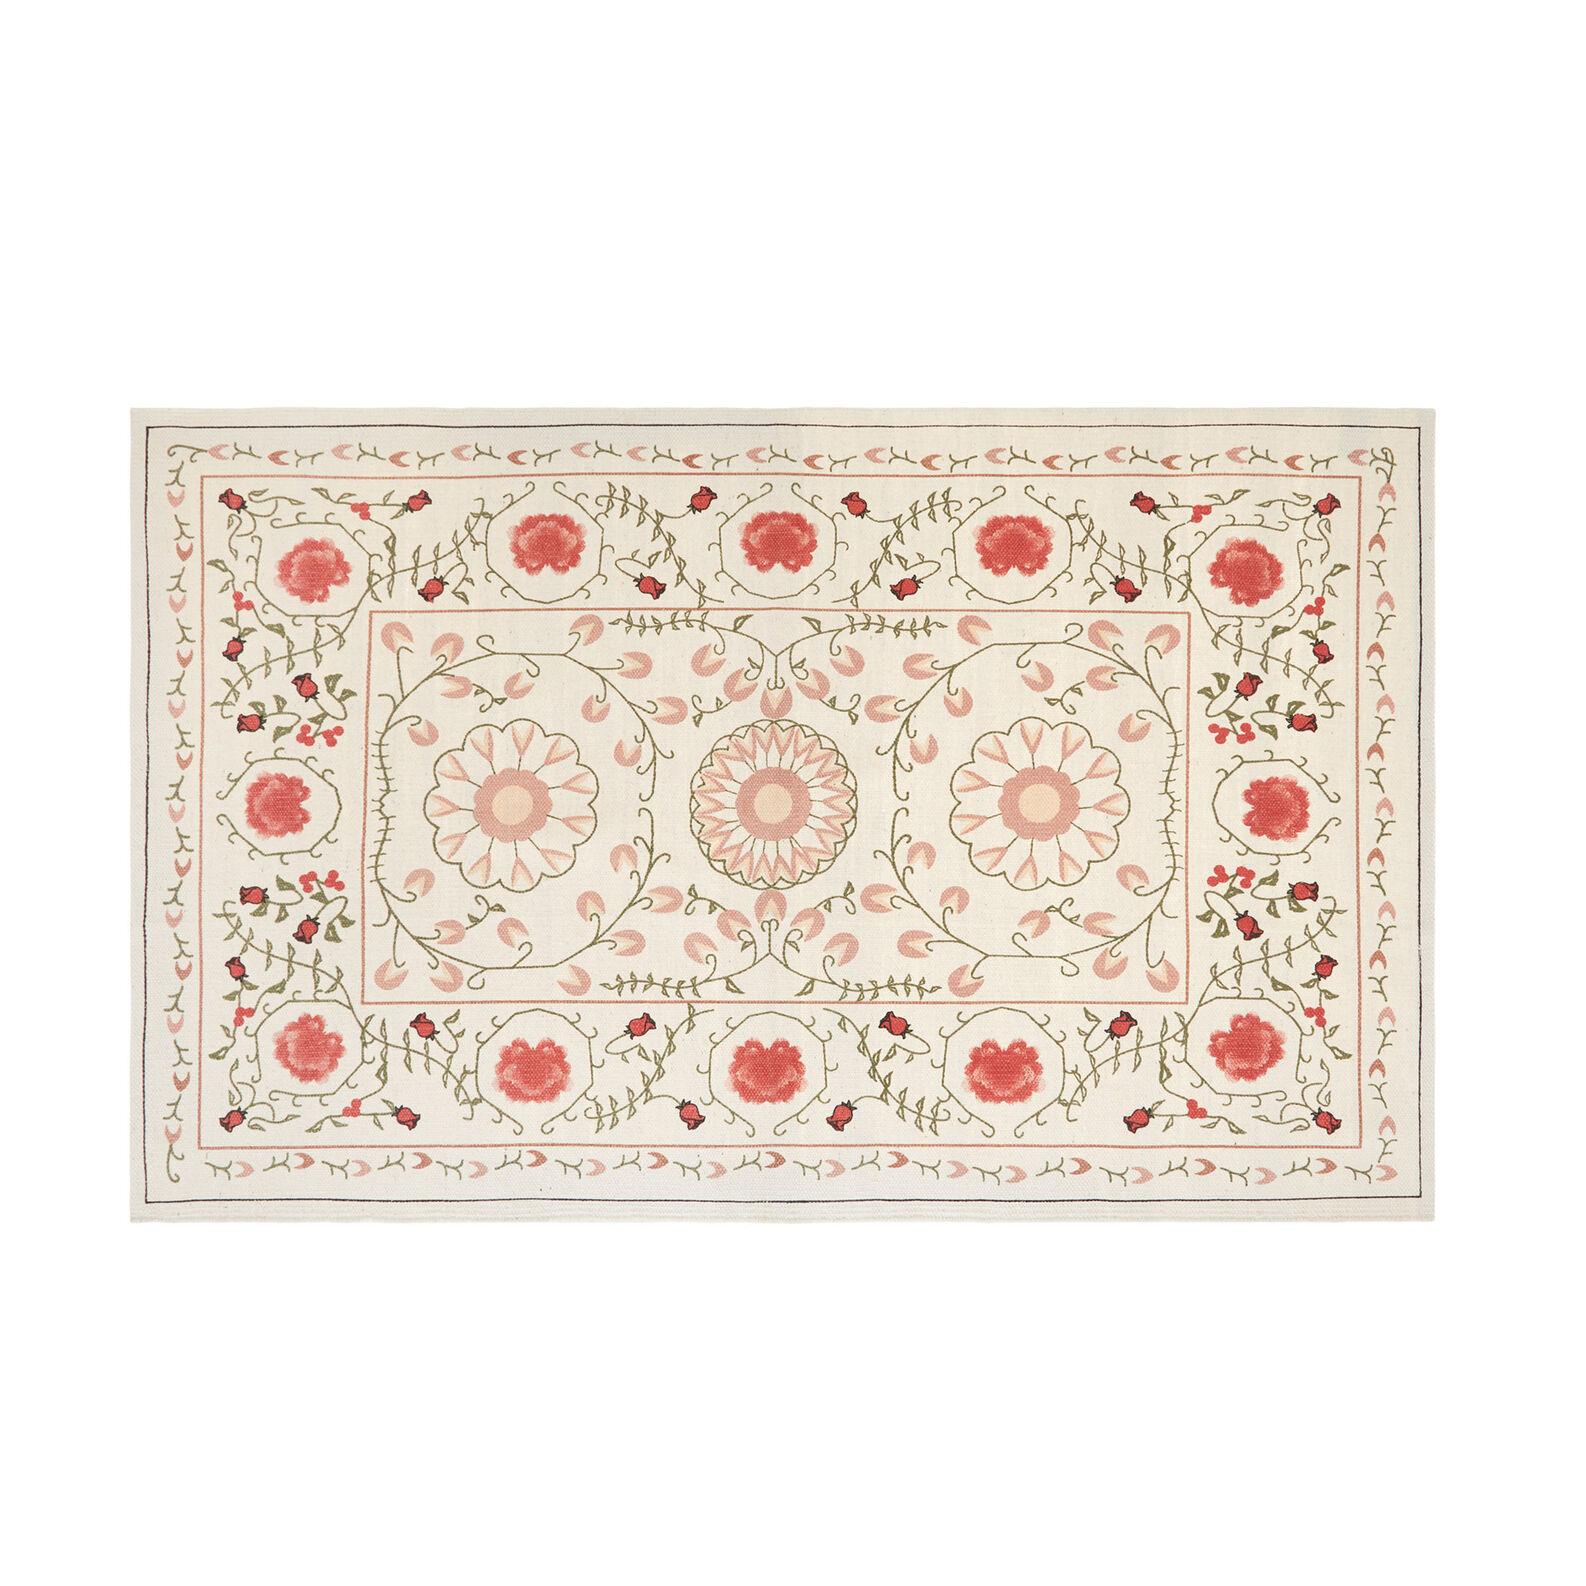 Cotton mat with floral motif print